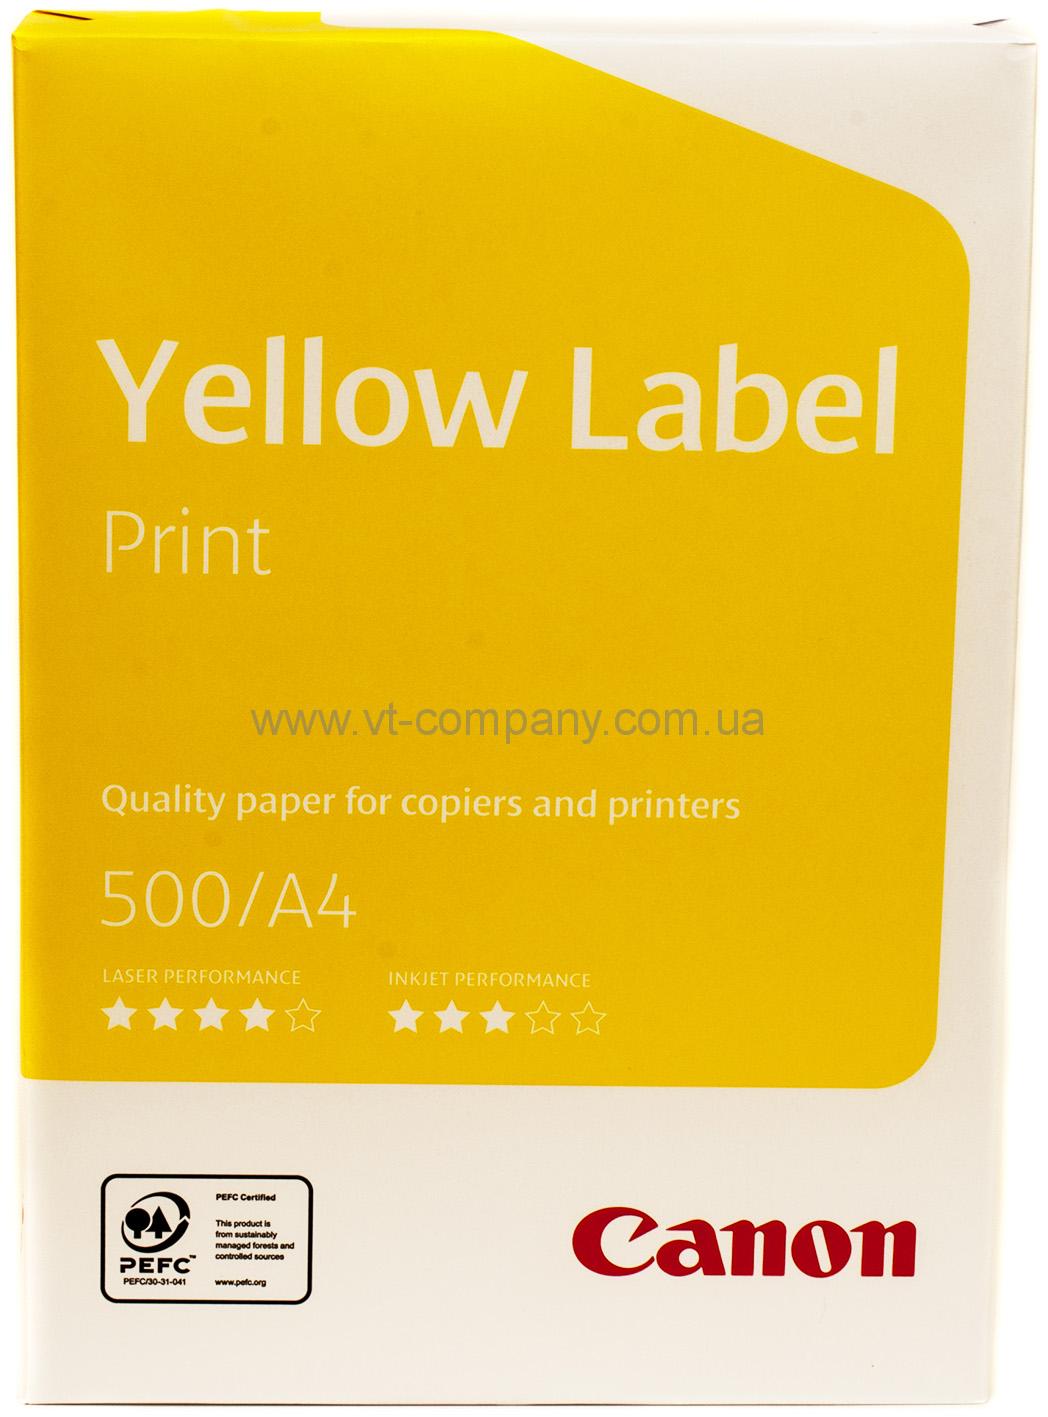 Бумага офисная Canon Yellow Label Print A4 Класс C+ 500 Листов